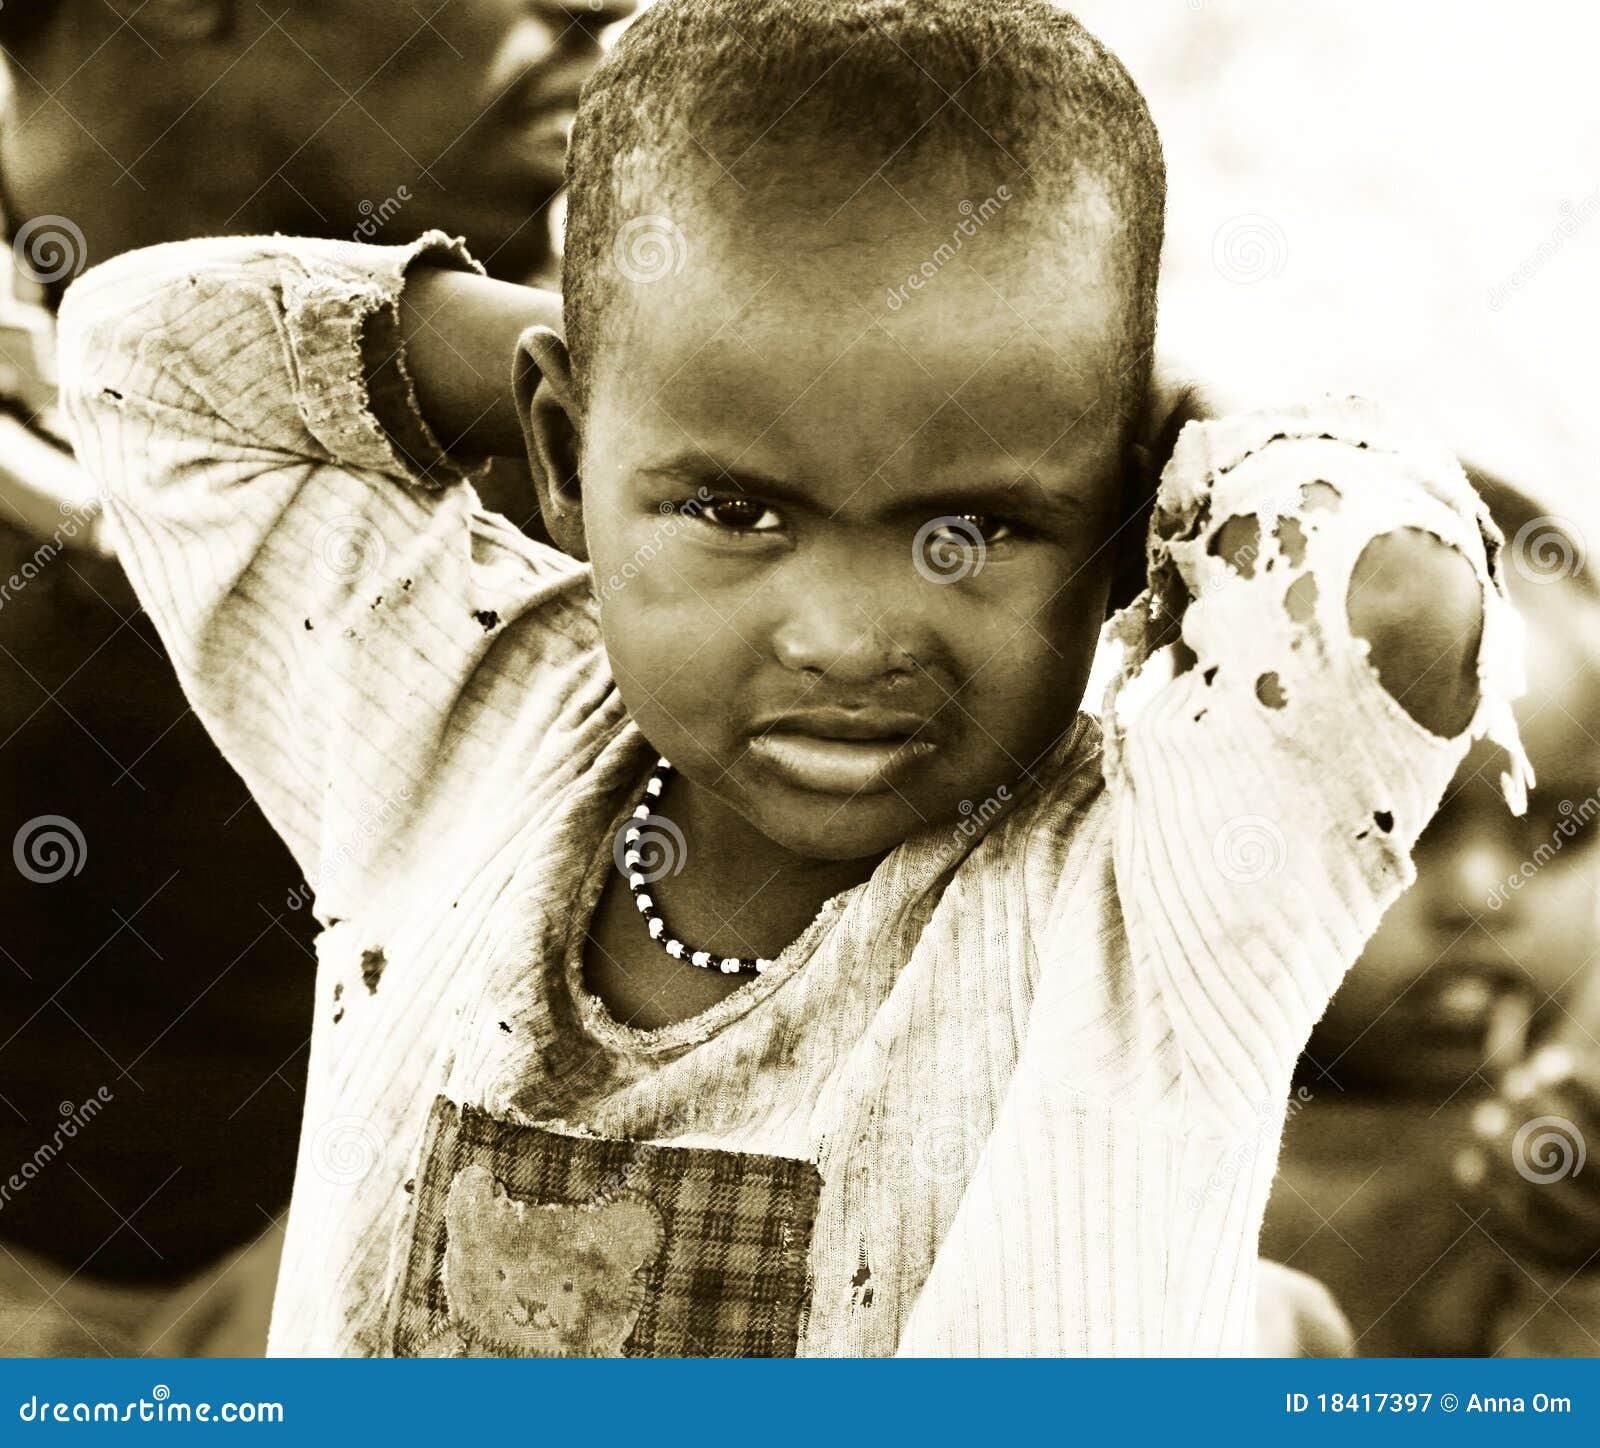 Africakenyasamburunovember 8portrait of an african kid of samburu tribe village posing to camerareview of daily life of local peoplenear samburu park